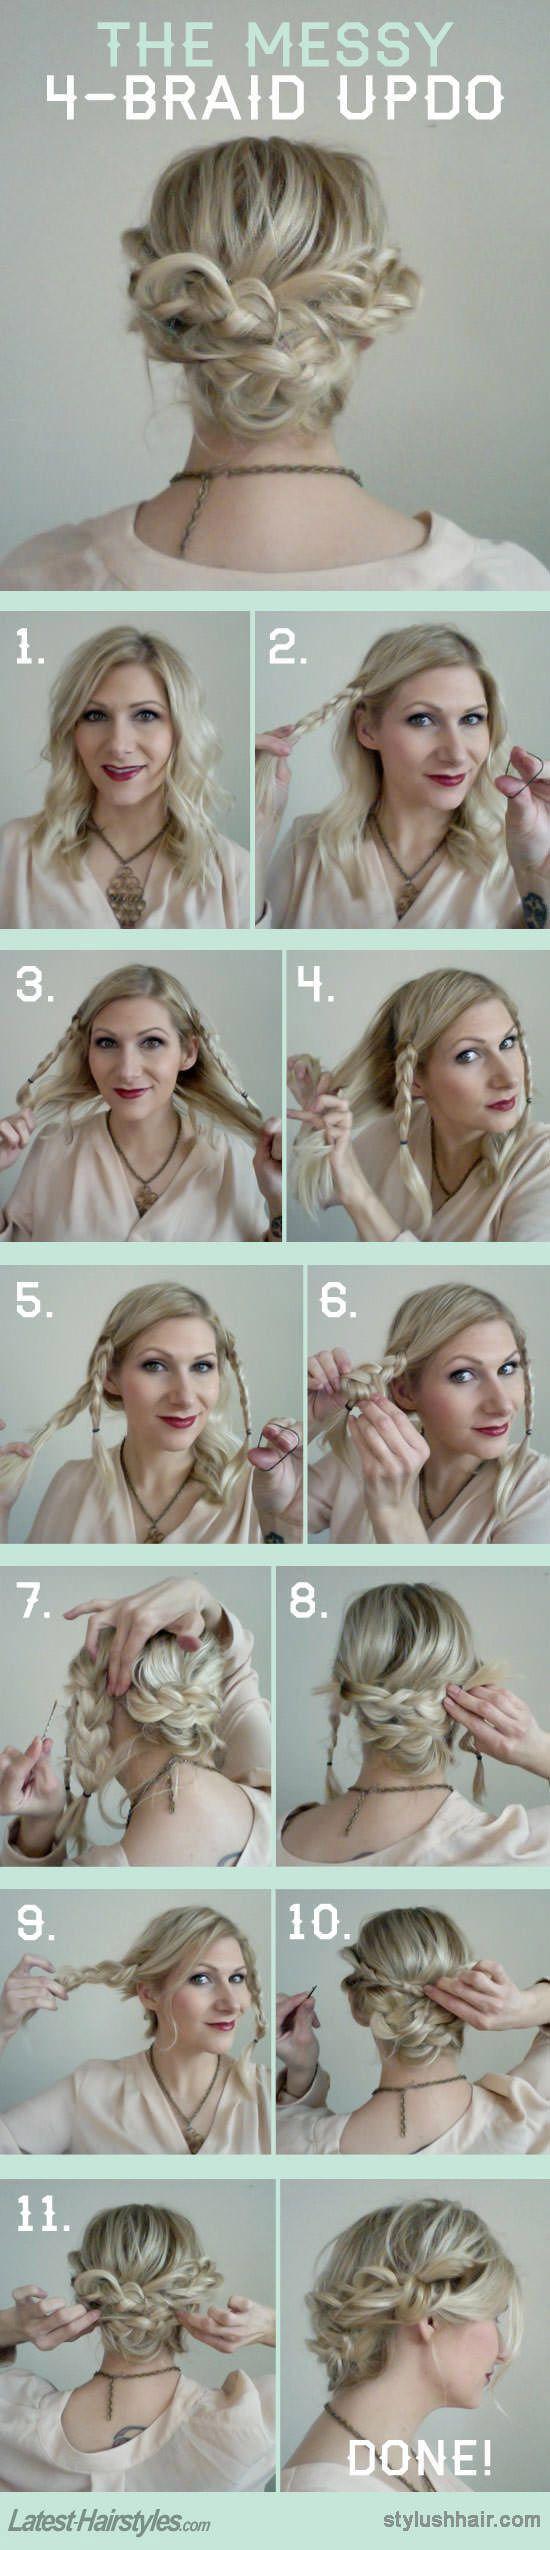 Image from http://cdn2.gurl.com/wp-content/uploads/2014/11/hairstylesformediumhair14.jpg.